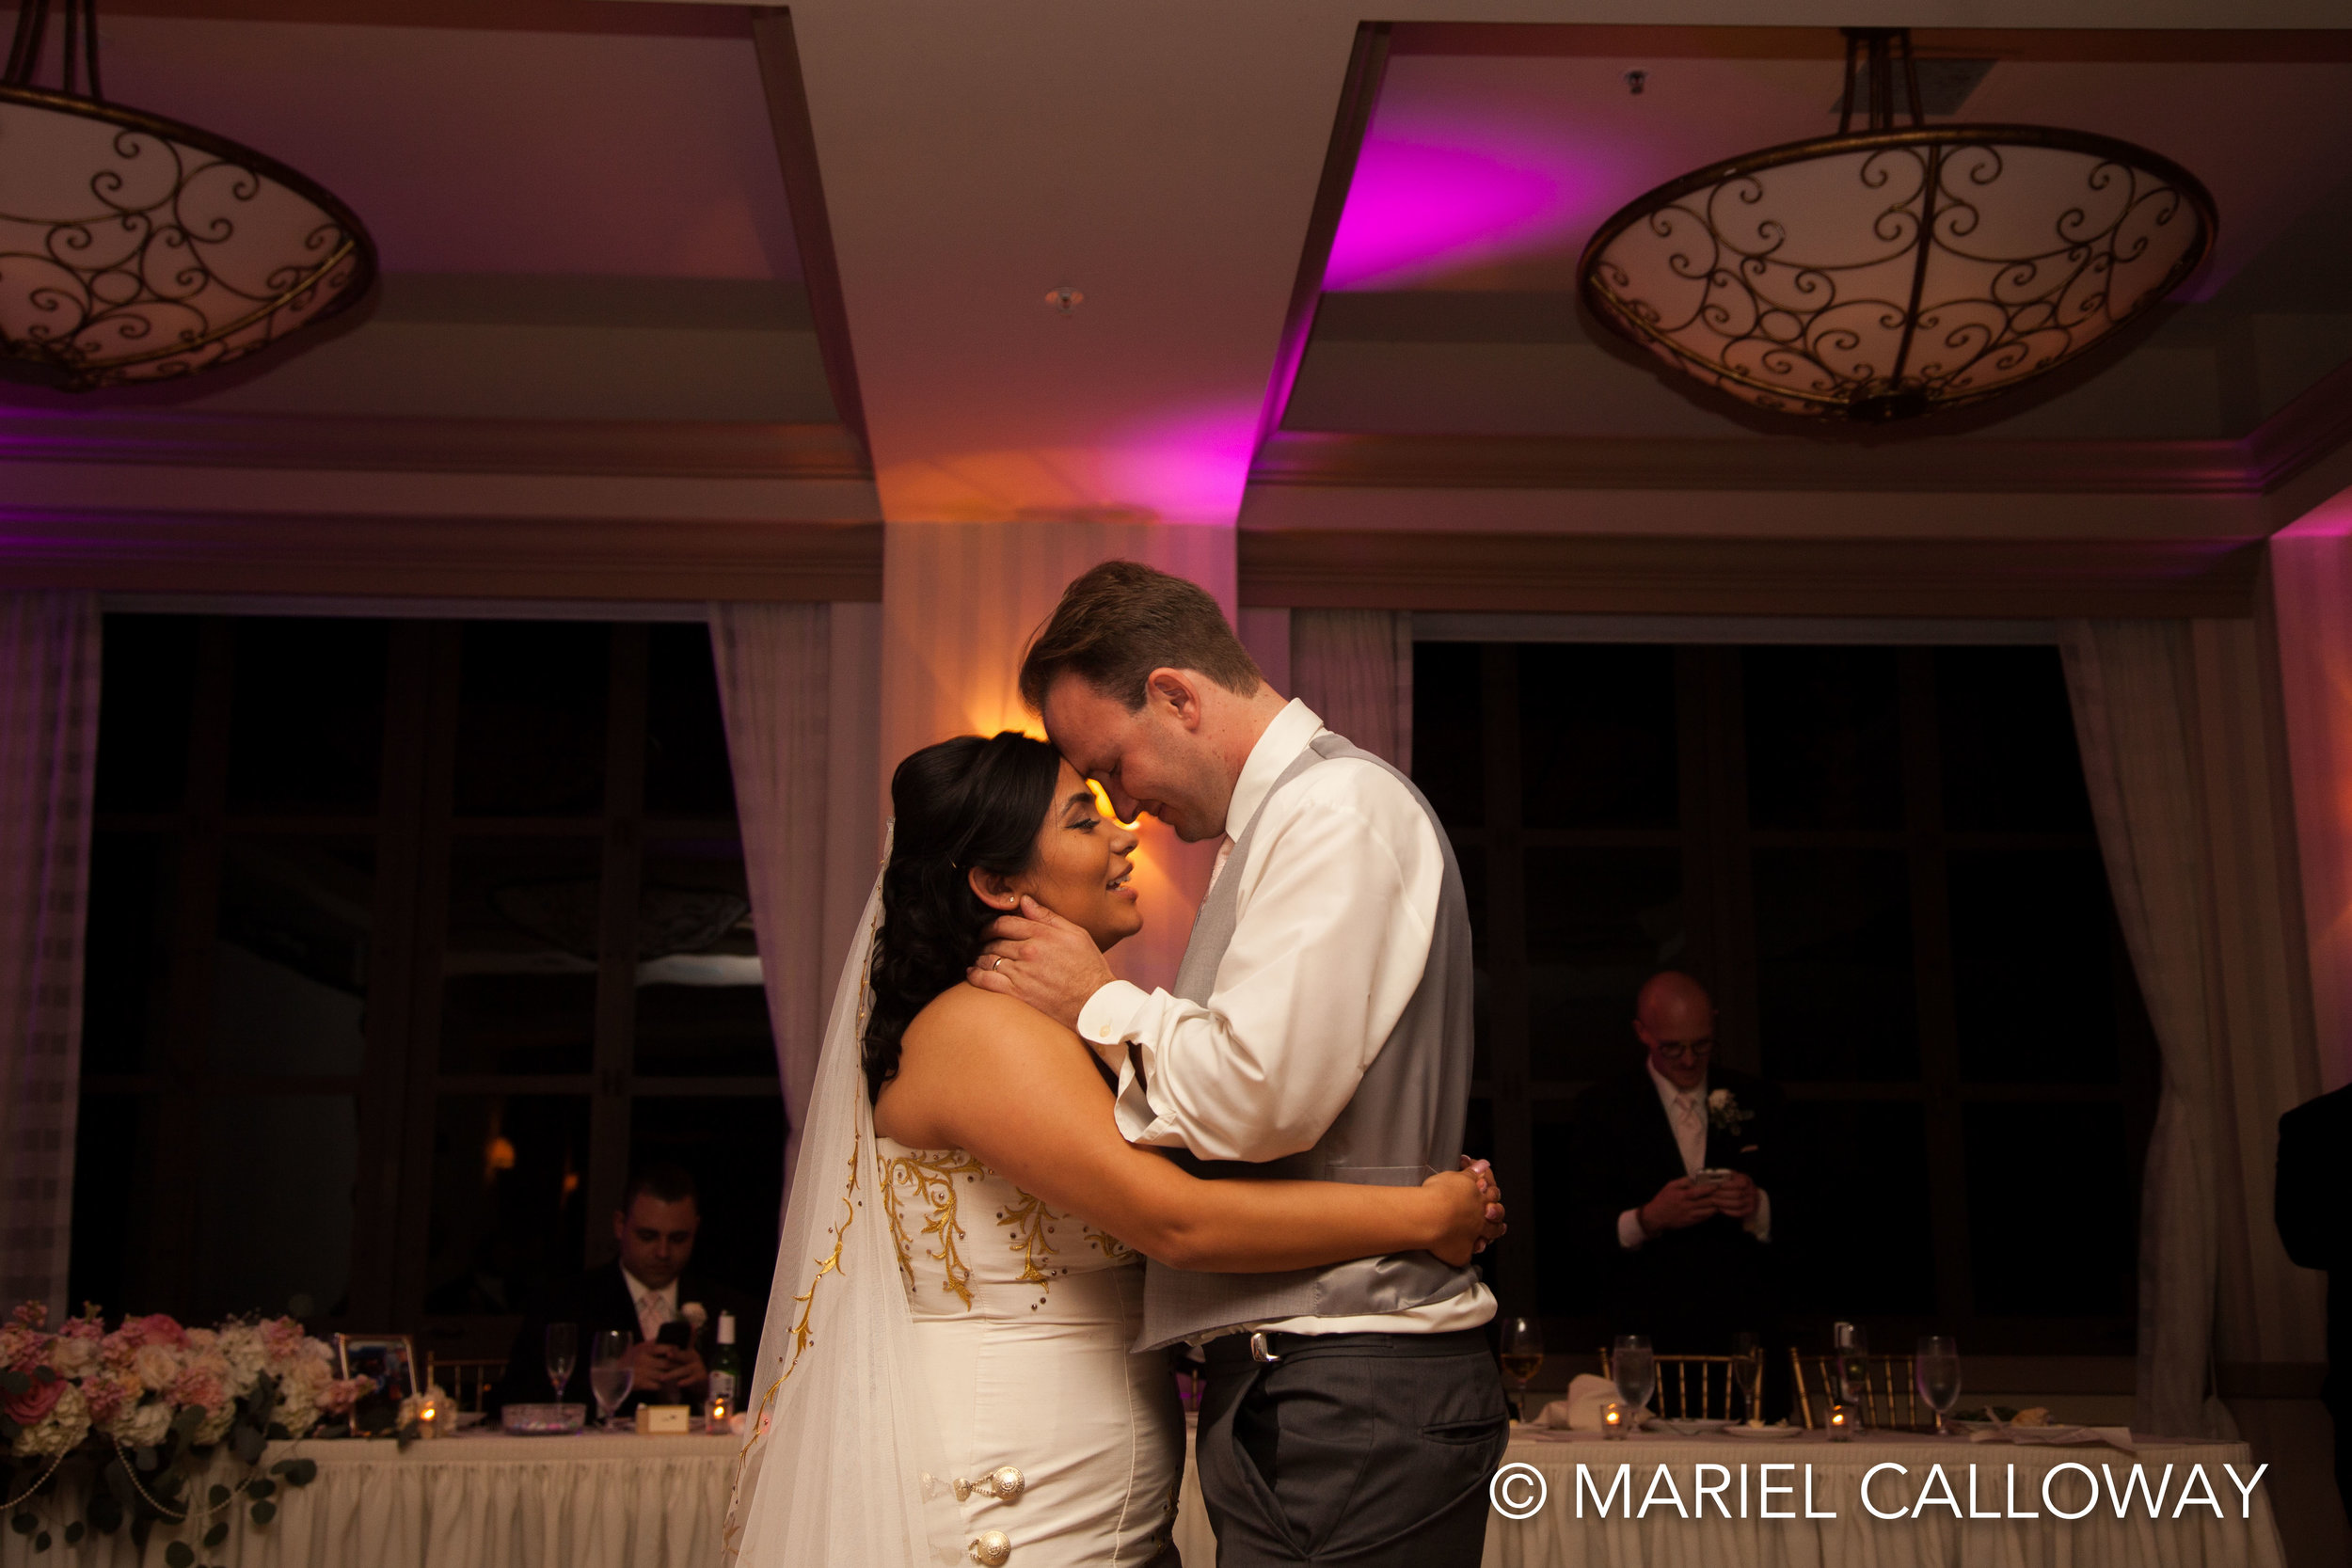 Mariel-Calloway-Los-Angeles-Wedding-Photography-Rossi-64.jpg